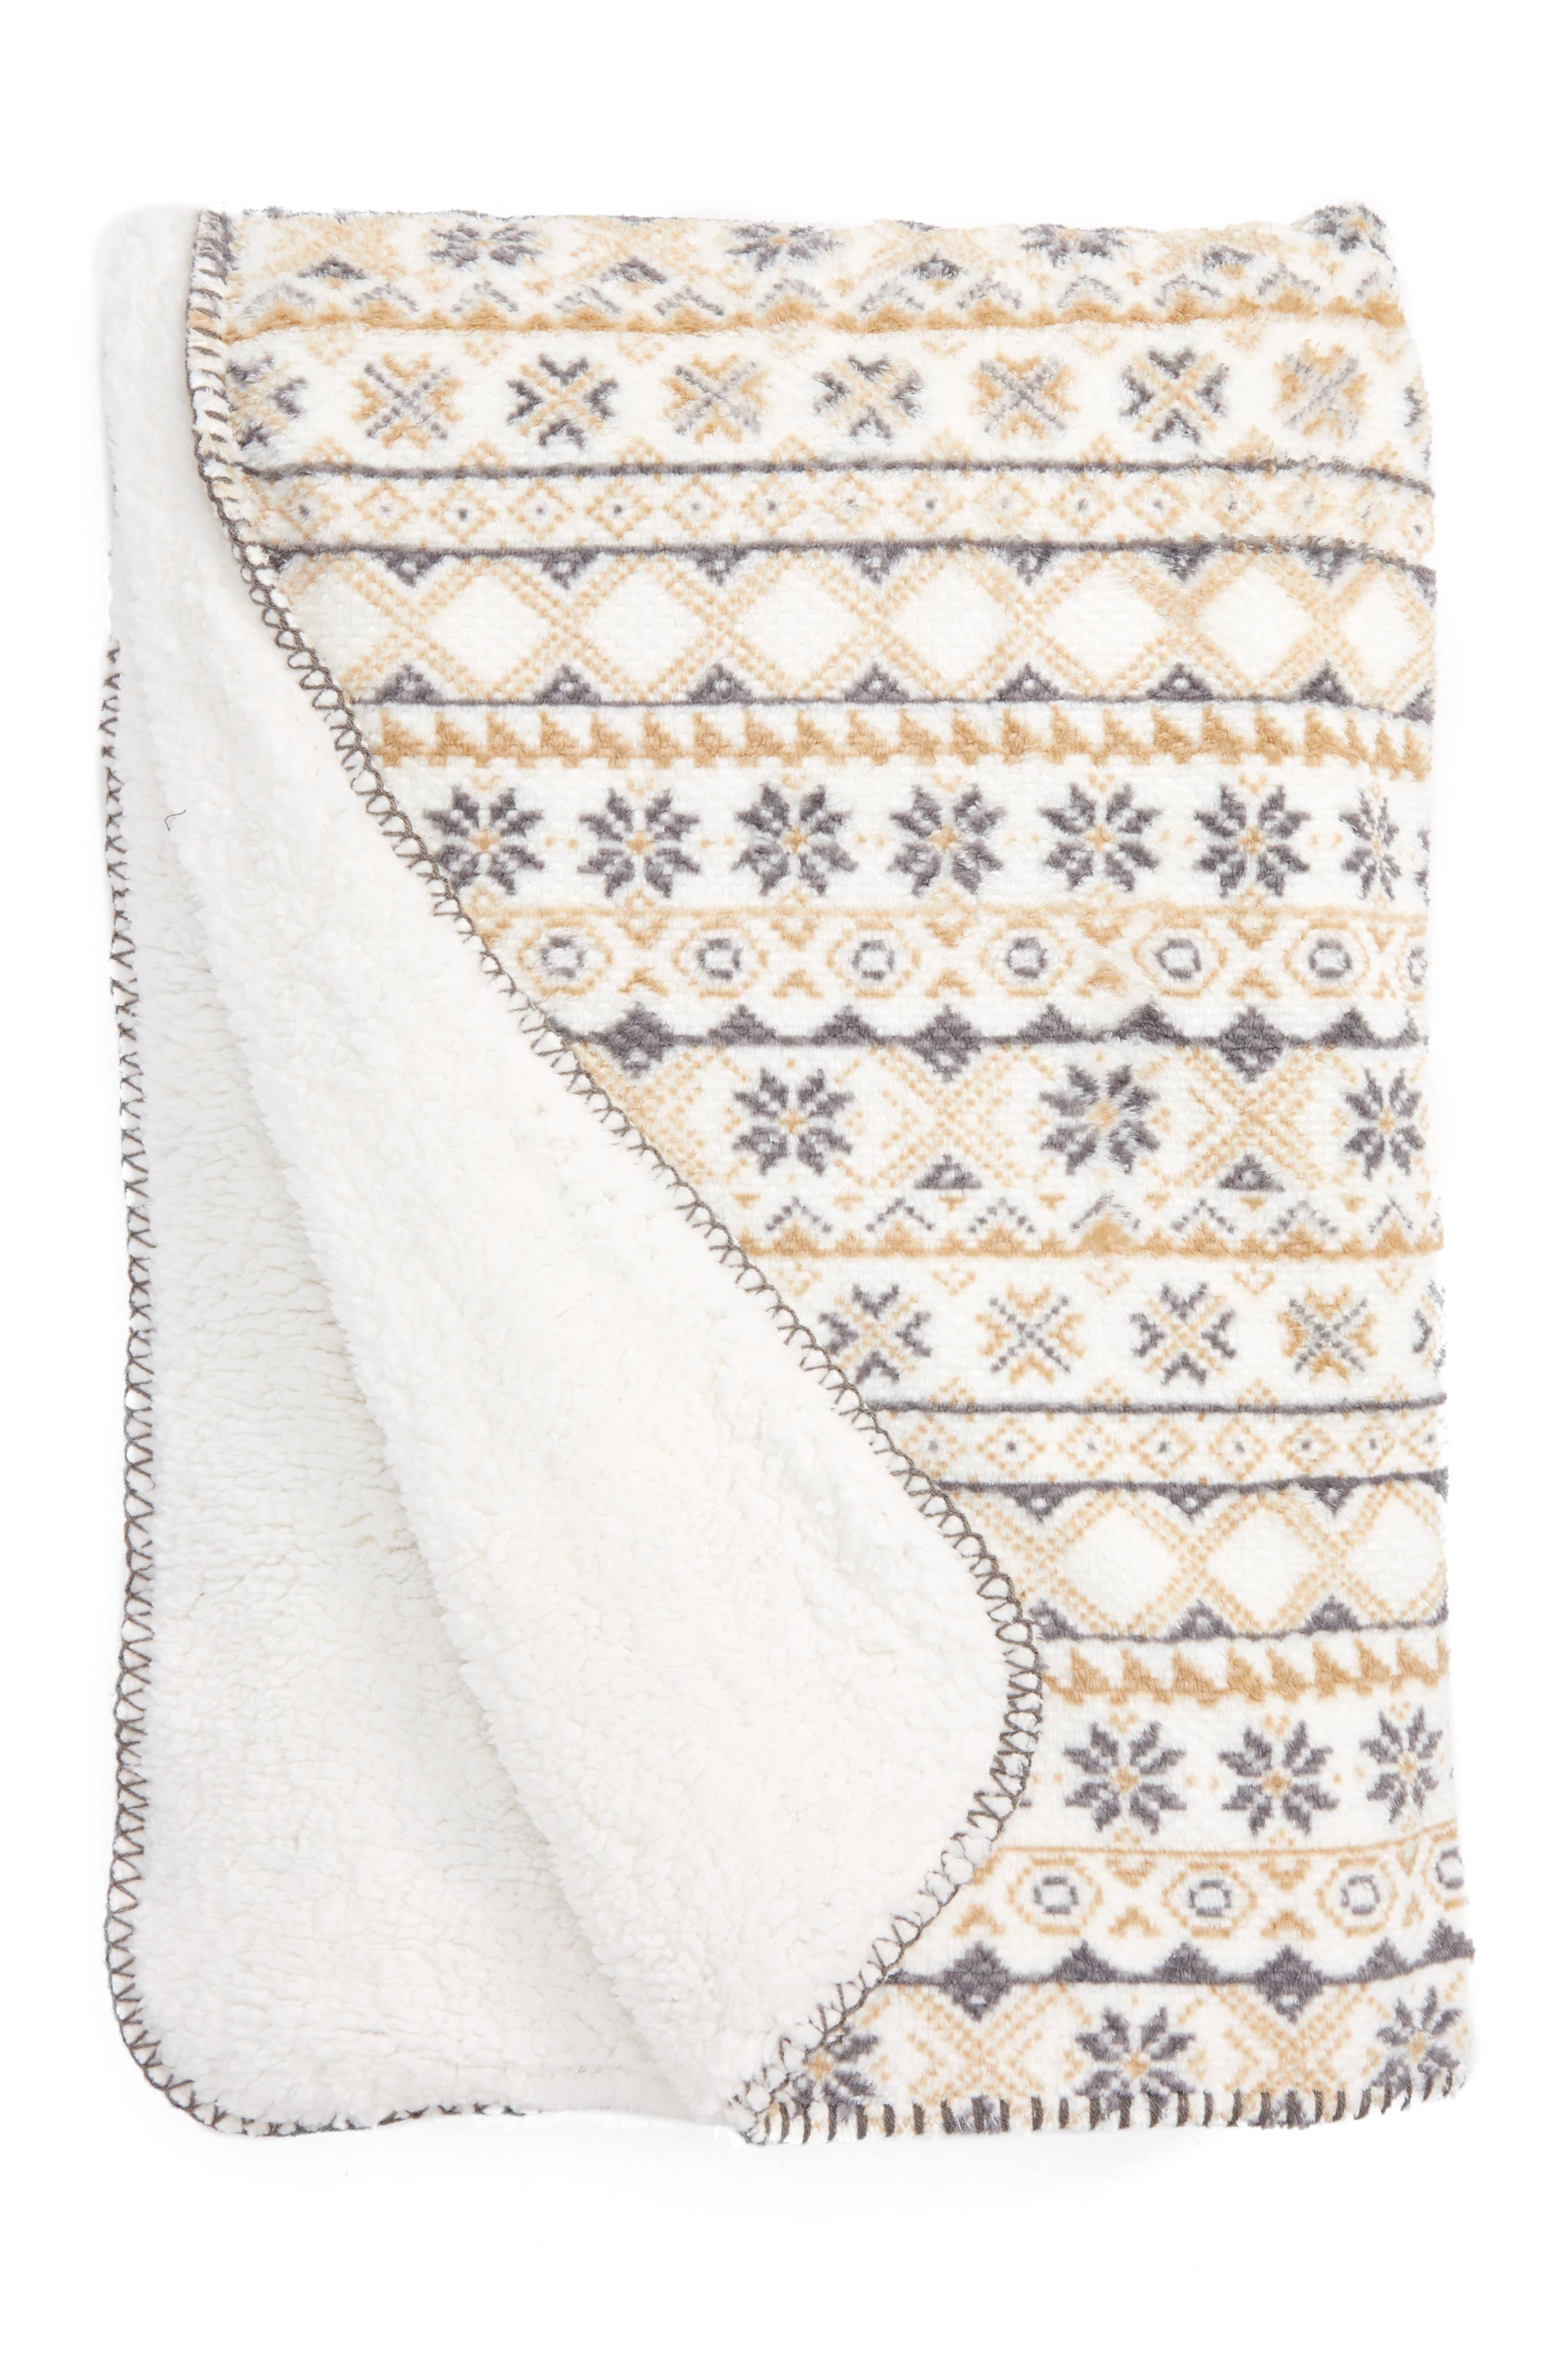 Fair Isle Print Faux Shearling Blanket,                         Main,                         color, Ivory